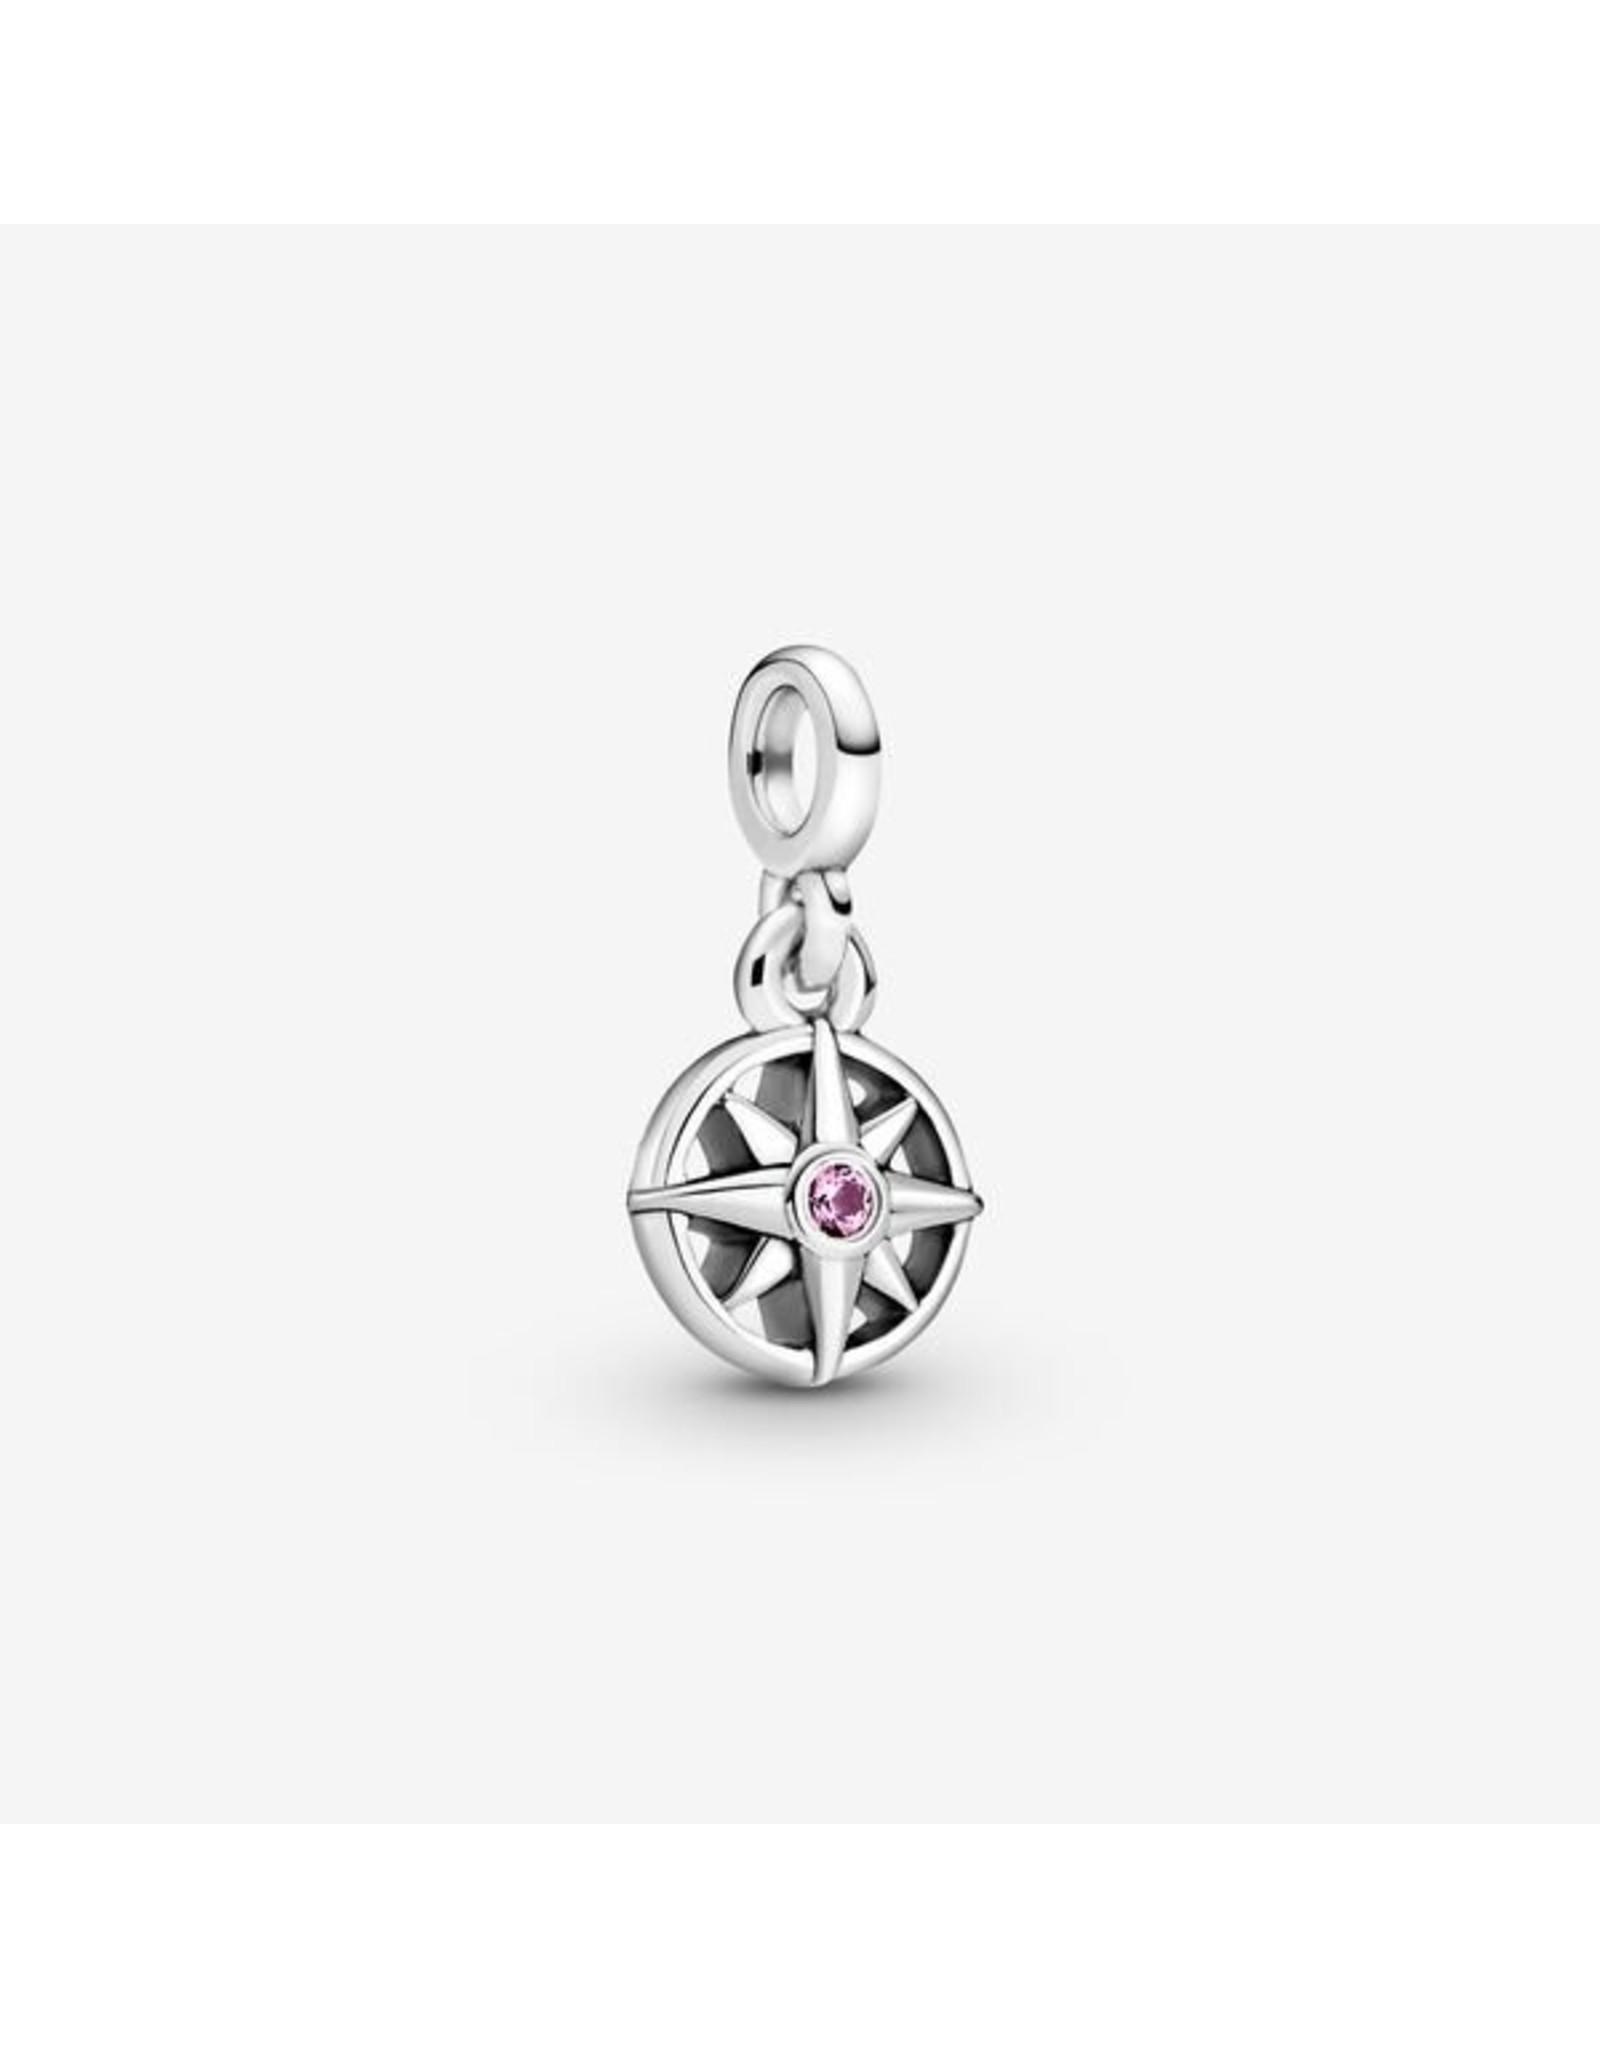 Pandora Pandora ME Charm,798975C01, My Compass Dangle, Cerise Crystal